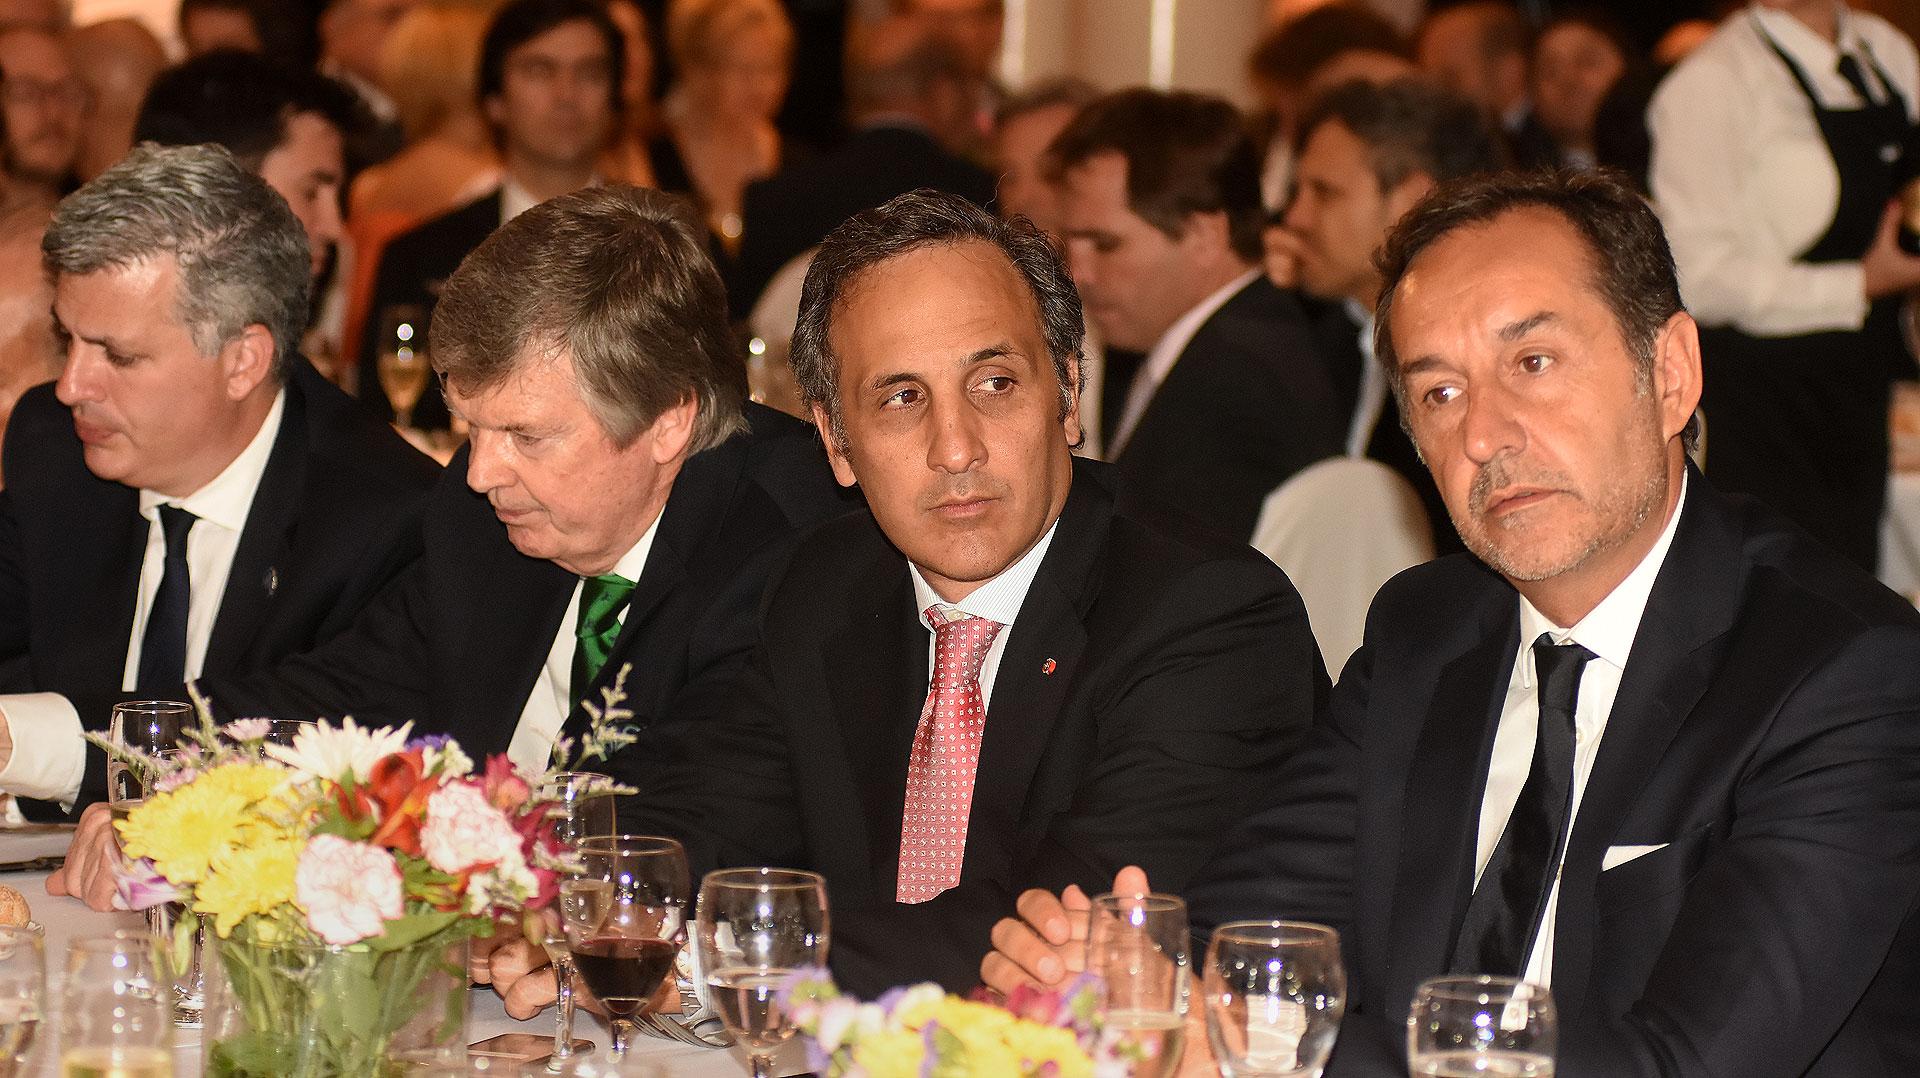 Marcelo Scaglione, Guillermo Stanley, Marcos Bulgheroni y Fulvio Pompeo